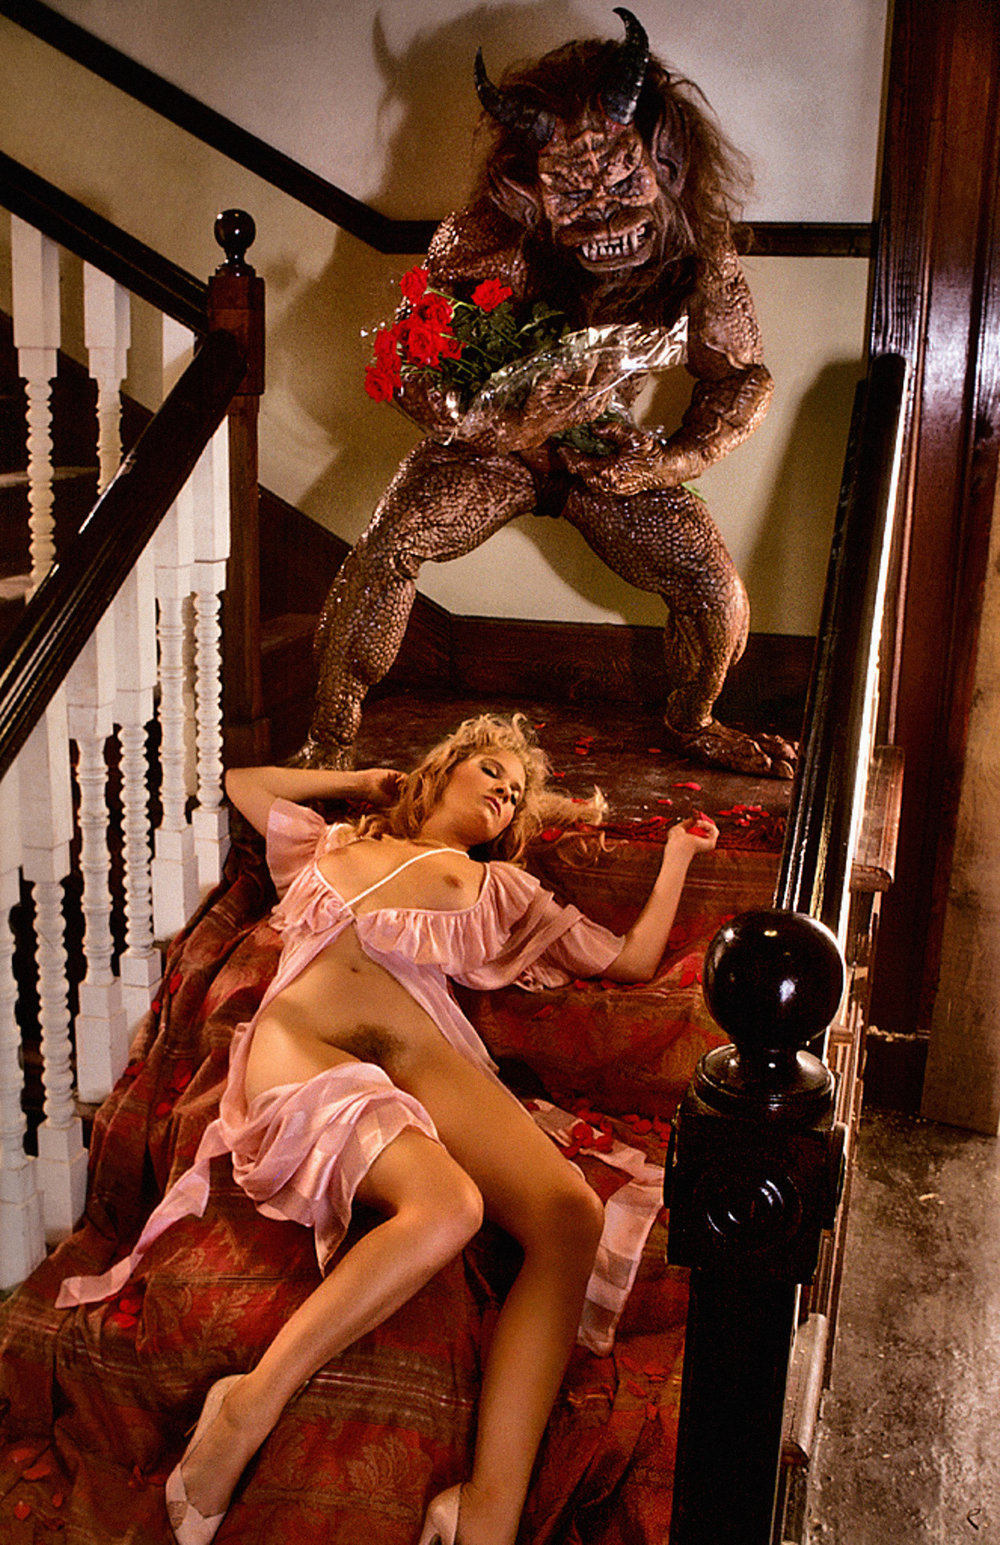 06 Barbara Crampton Simply Beastly 1986.jpg